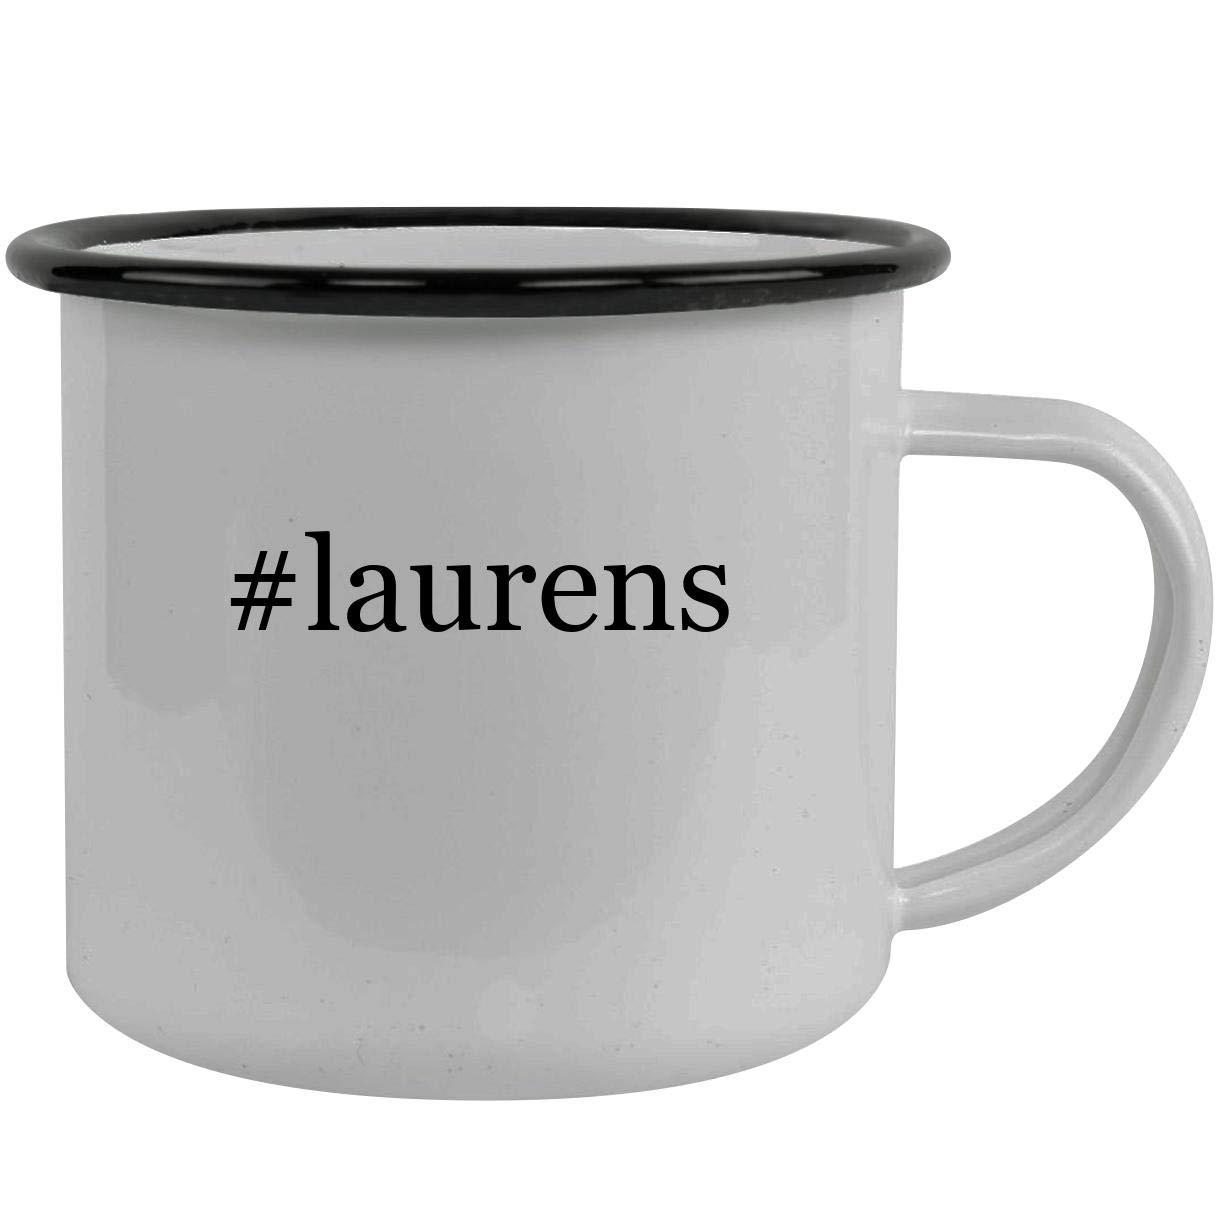 #laurens - Stainless Steel Hashtag 12oz Camping Mug, Black